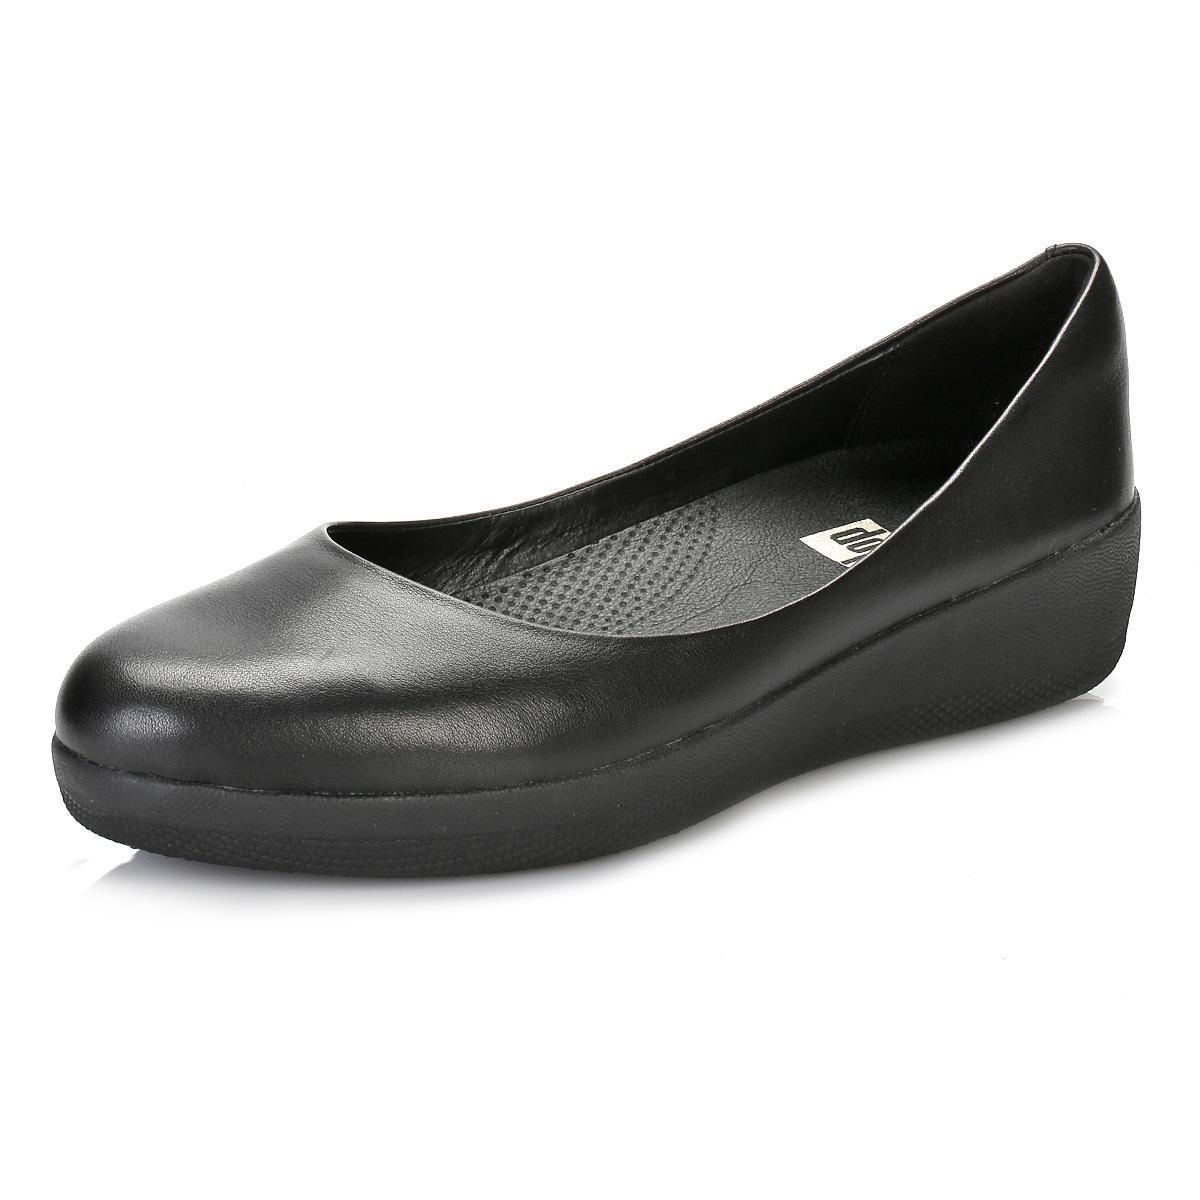 Fitflop Black Ladies Shoes